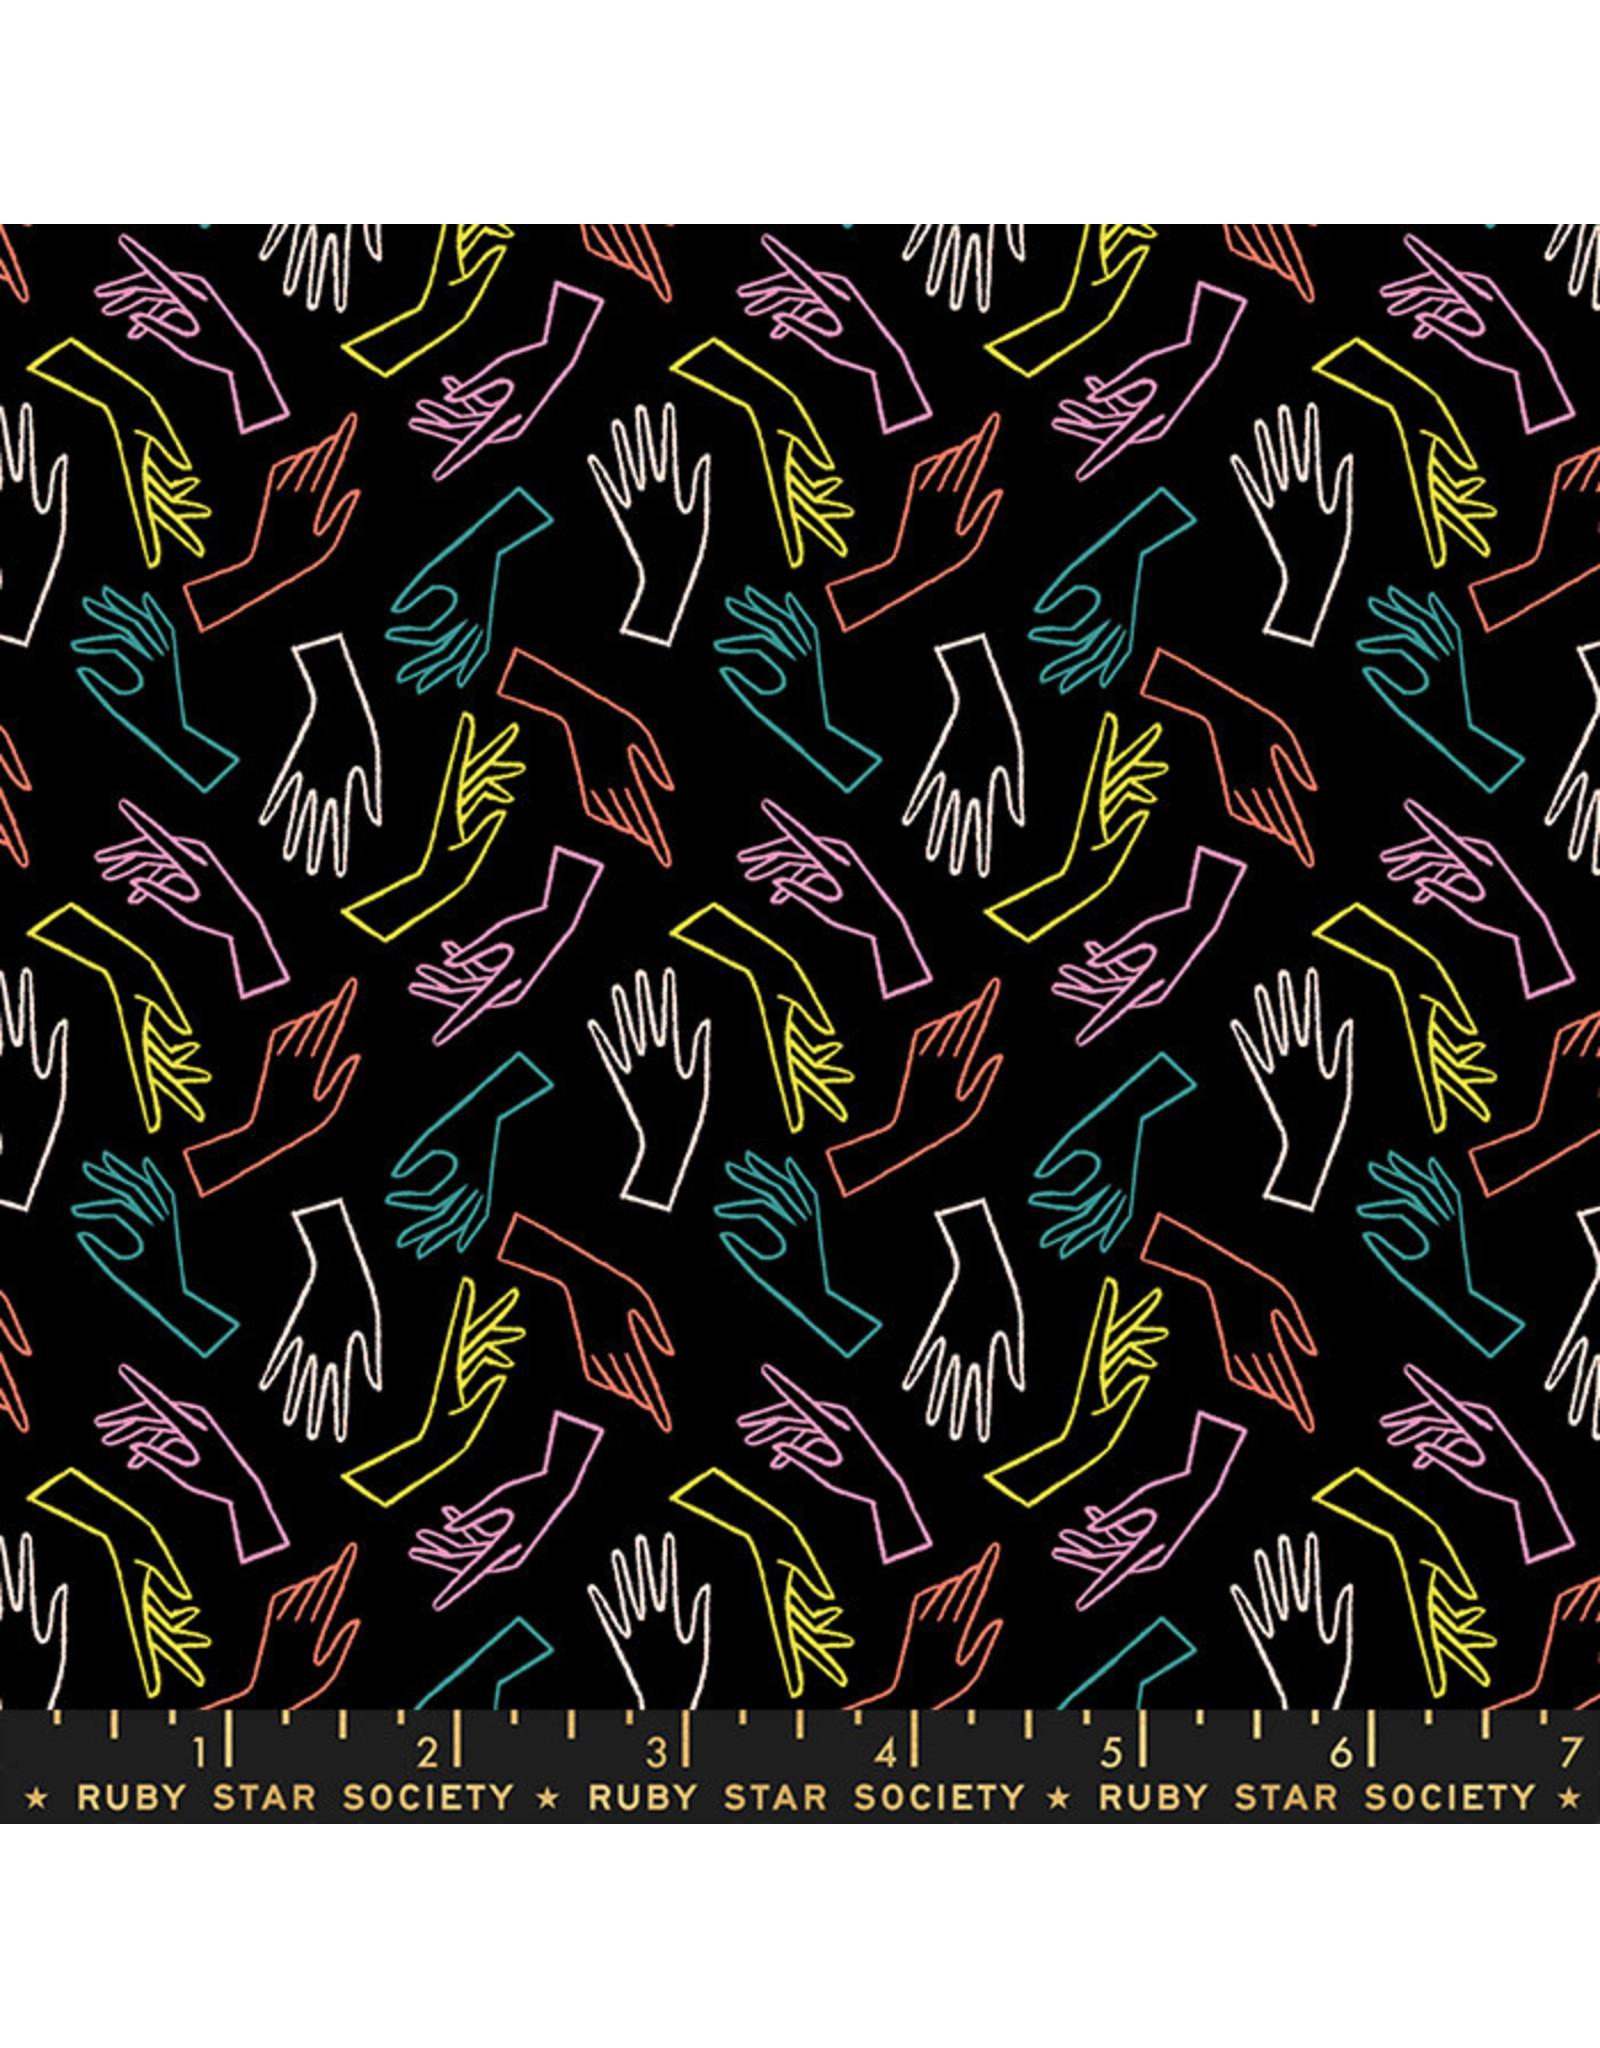 Ruby Star Society Adorn - Gestures Black